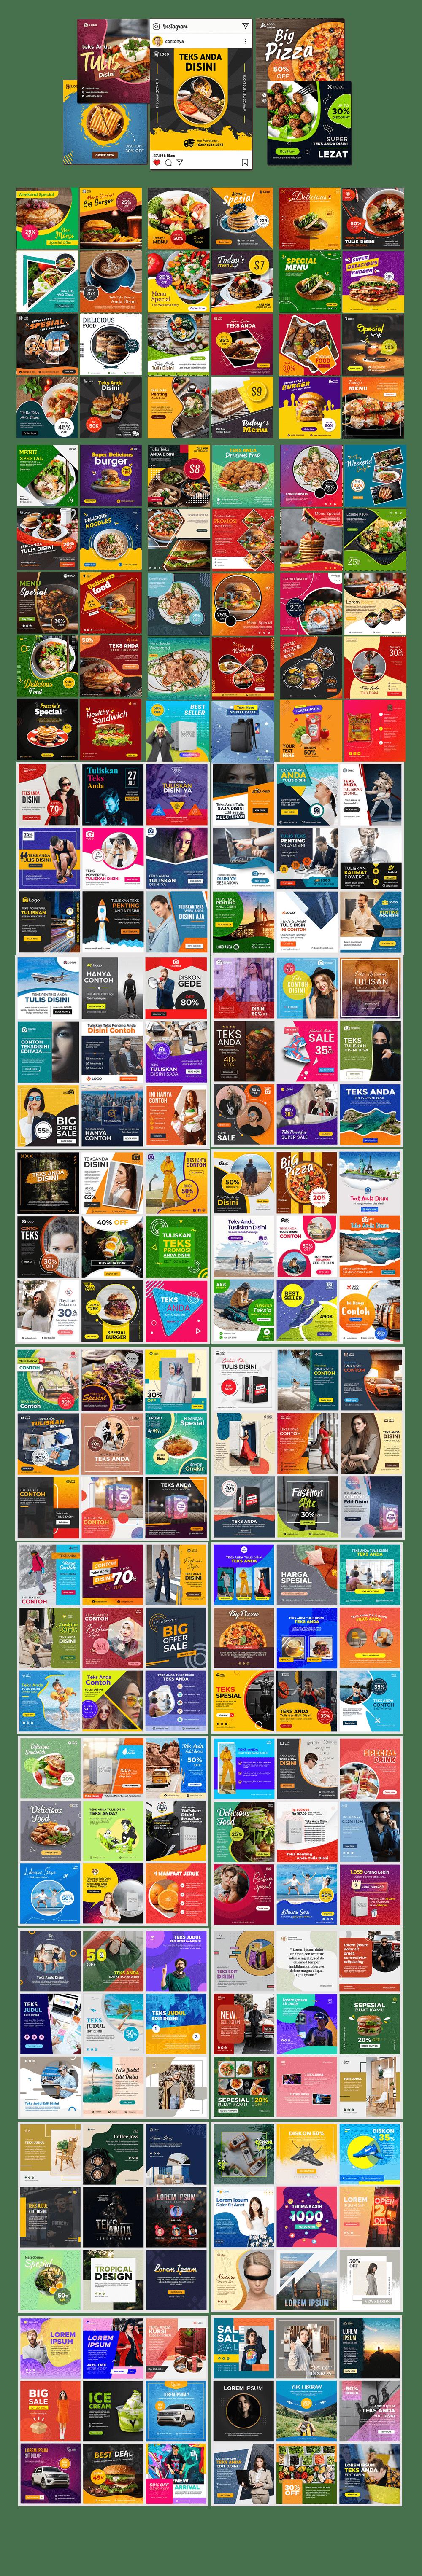 Creative-Agency-FX-feature-7-module-7